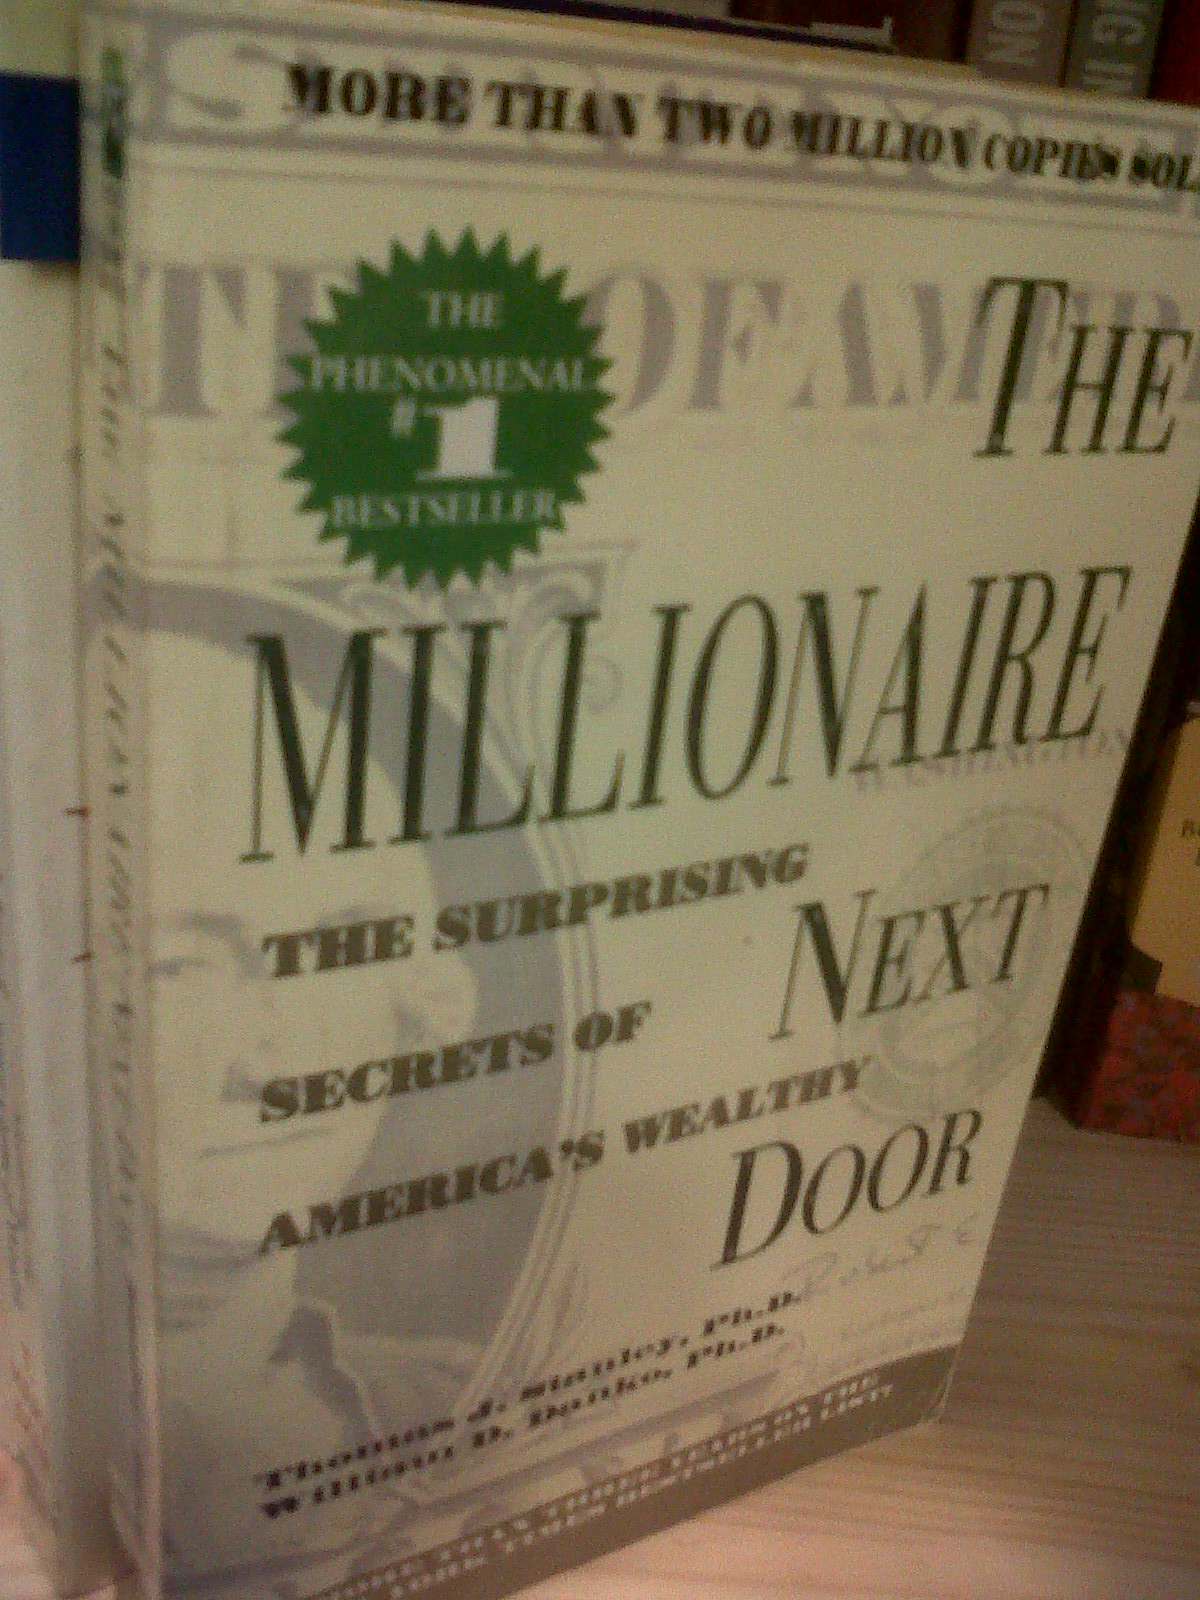 Millionaire Next Door Thomas J. Stanley